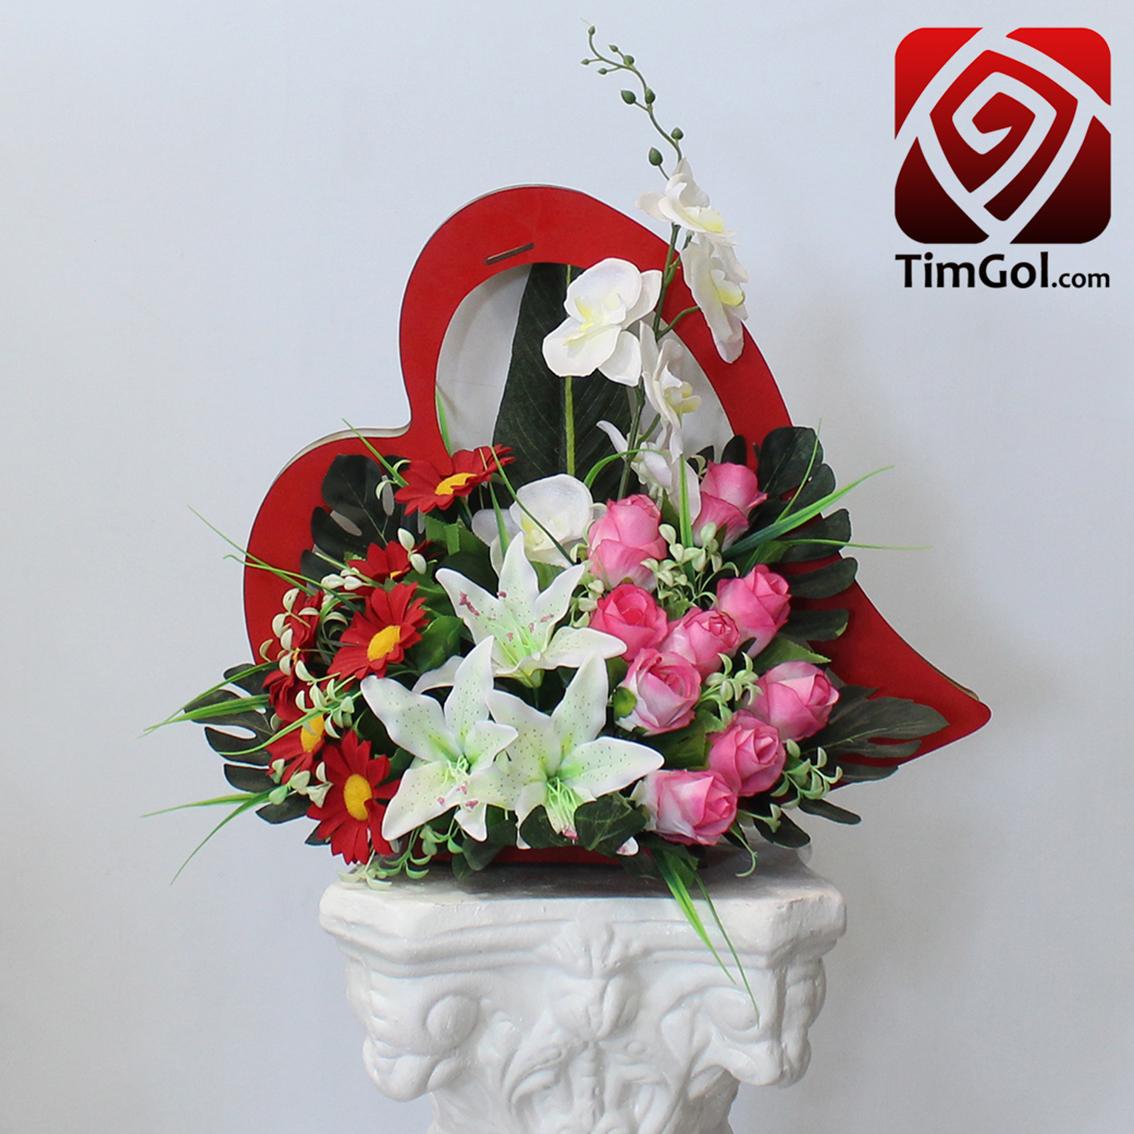 گل مصنوعی لیلیوم و گل مصنوعی ارکیده